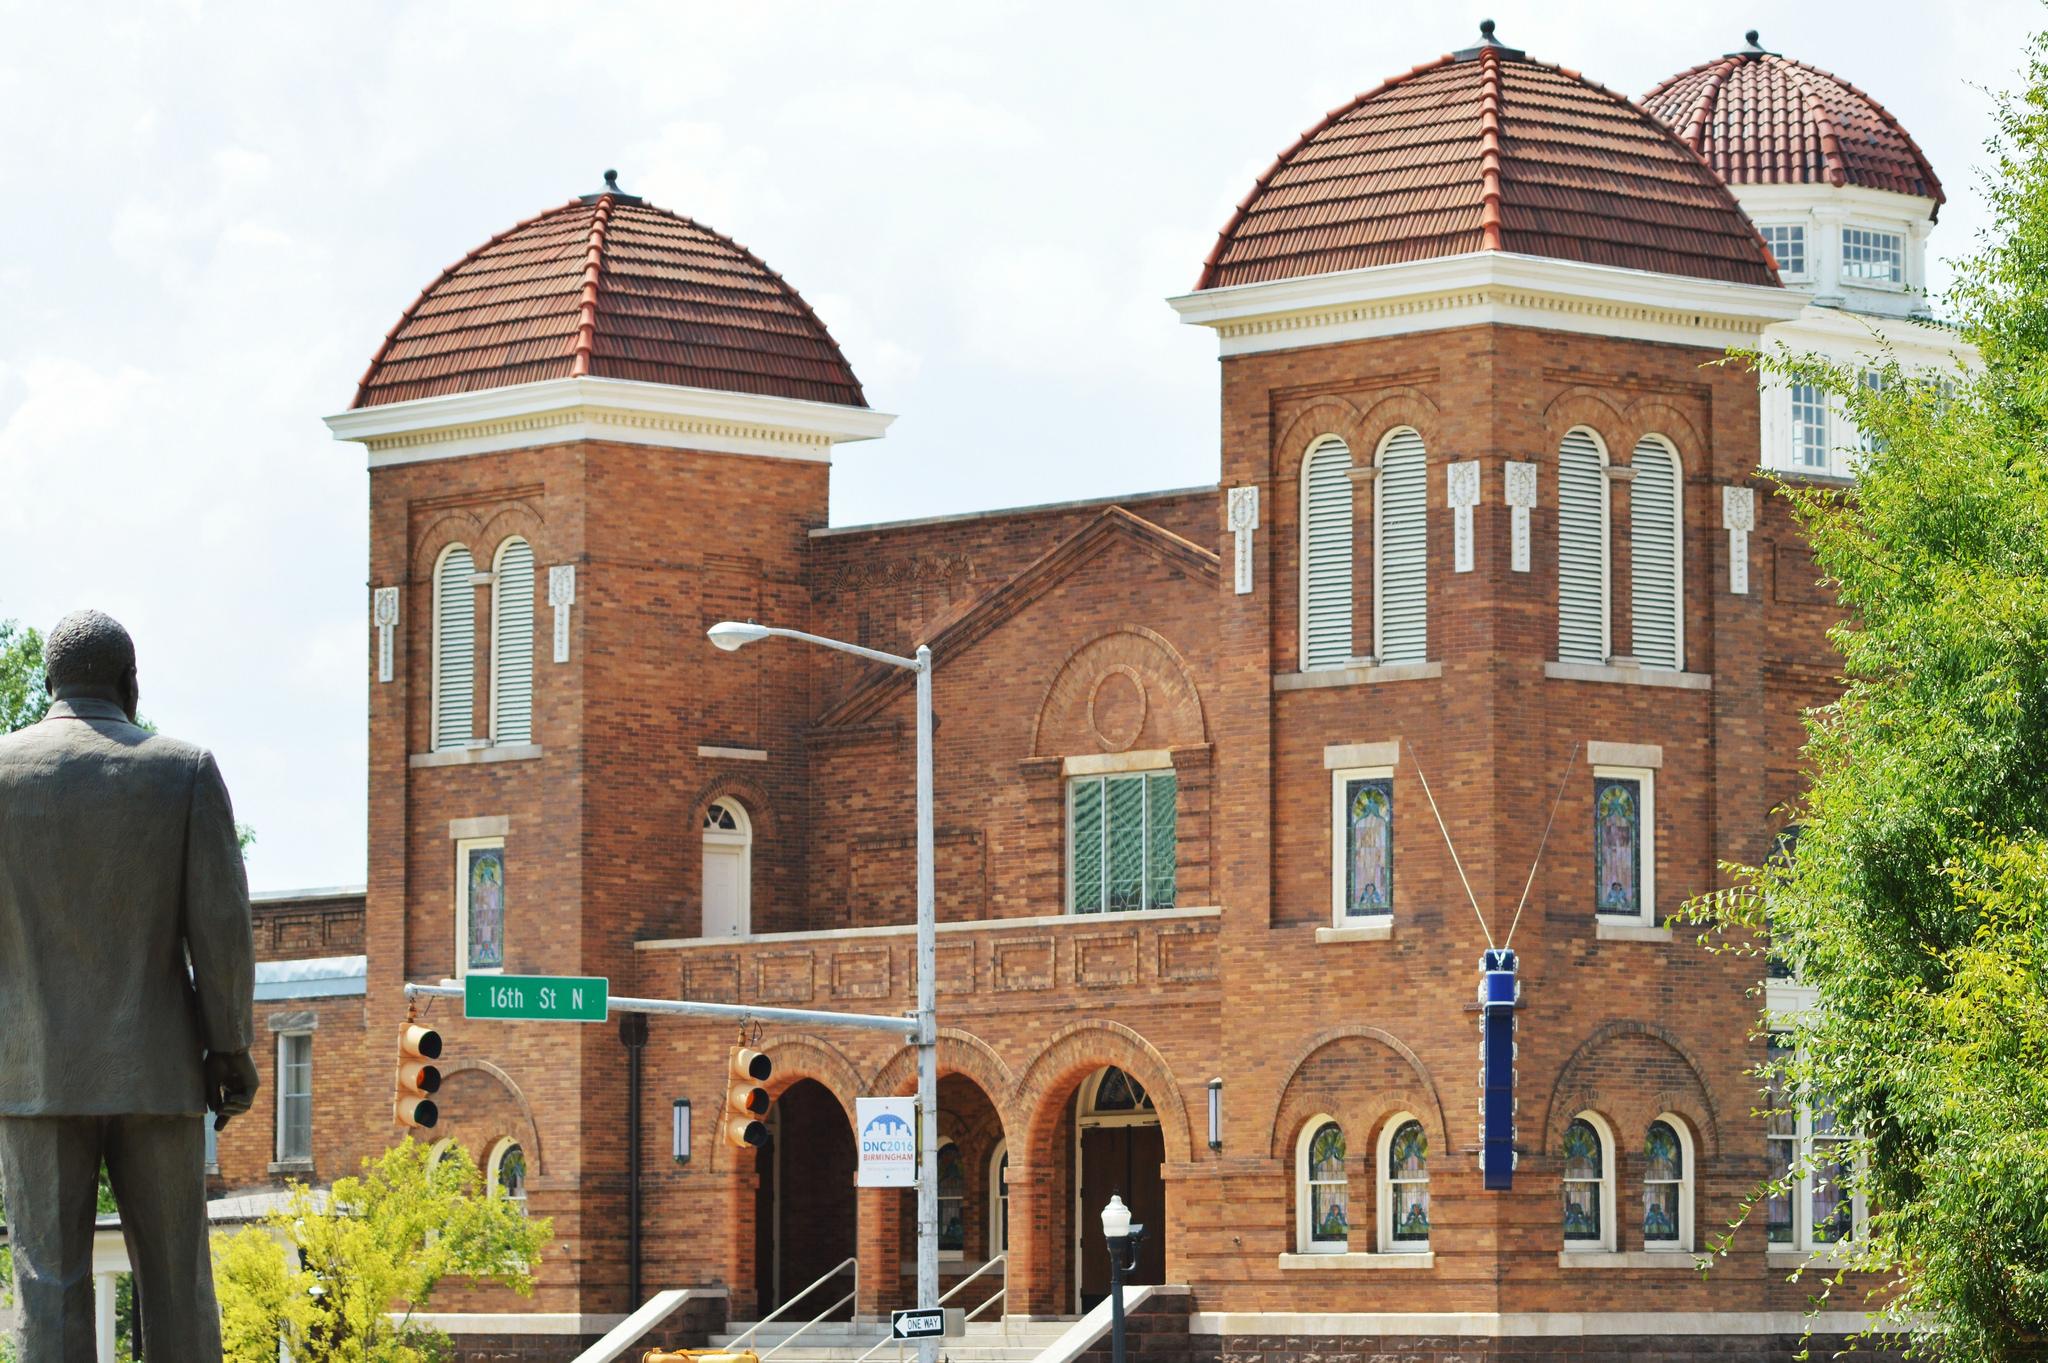 Copy of 16th Street Baptist, Birmingham